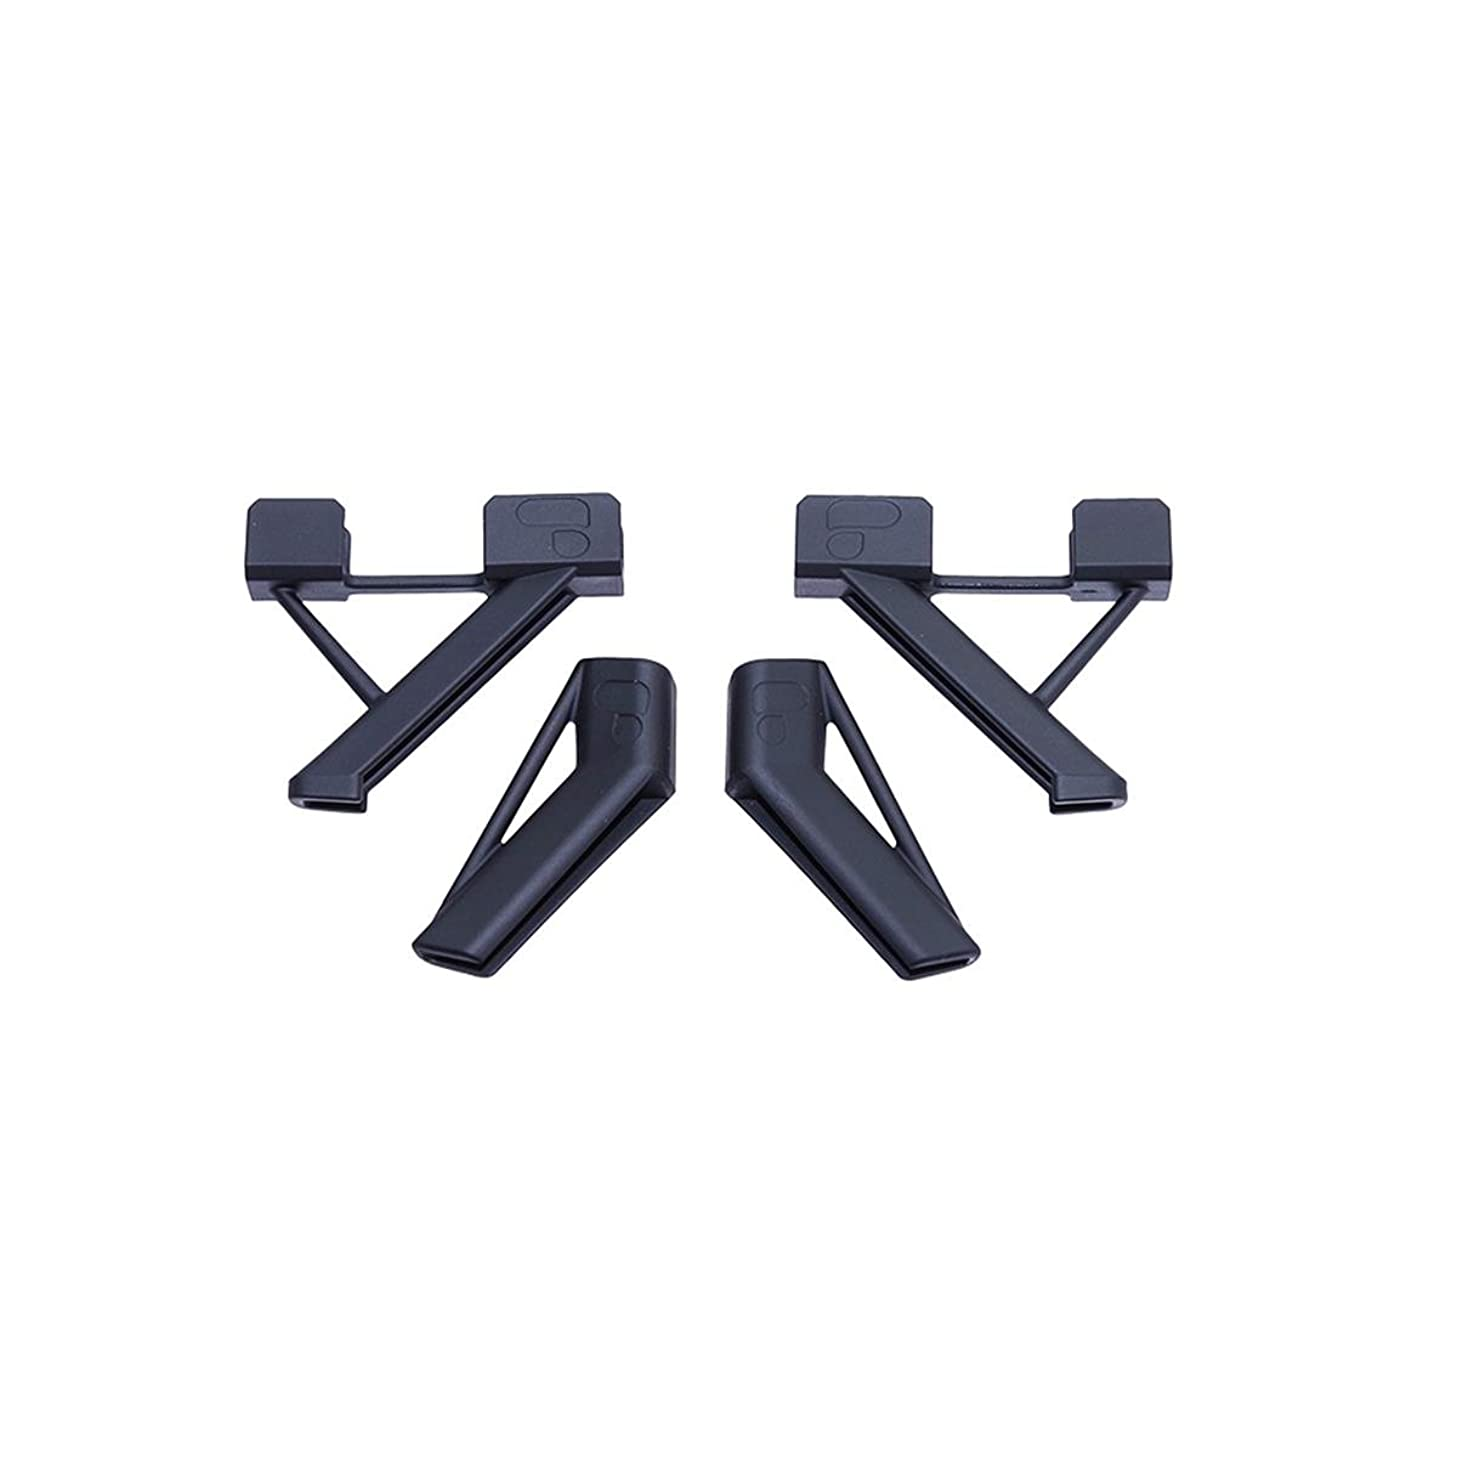 PolarPro Landing Gear/Leg Extensions for DJI Mavic Pro/Mavic Platinum